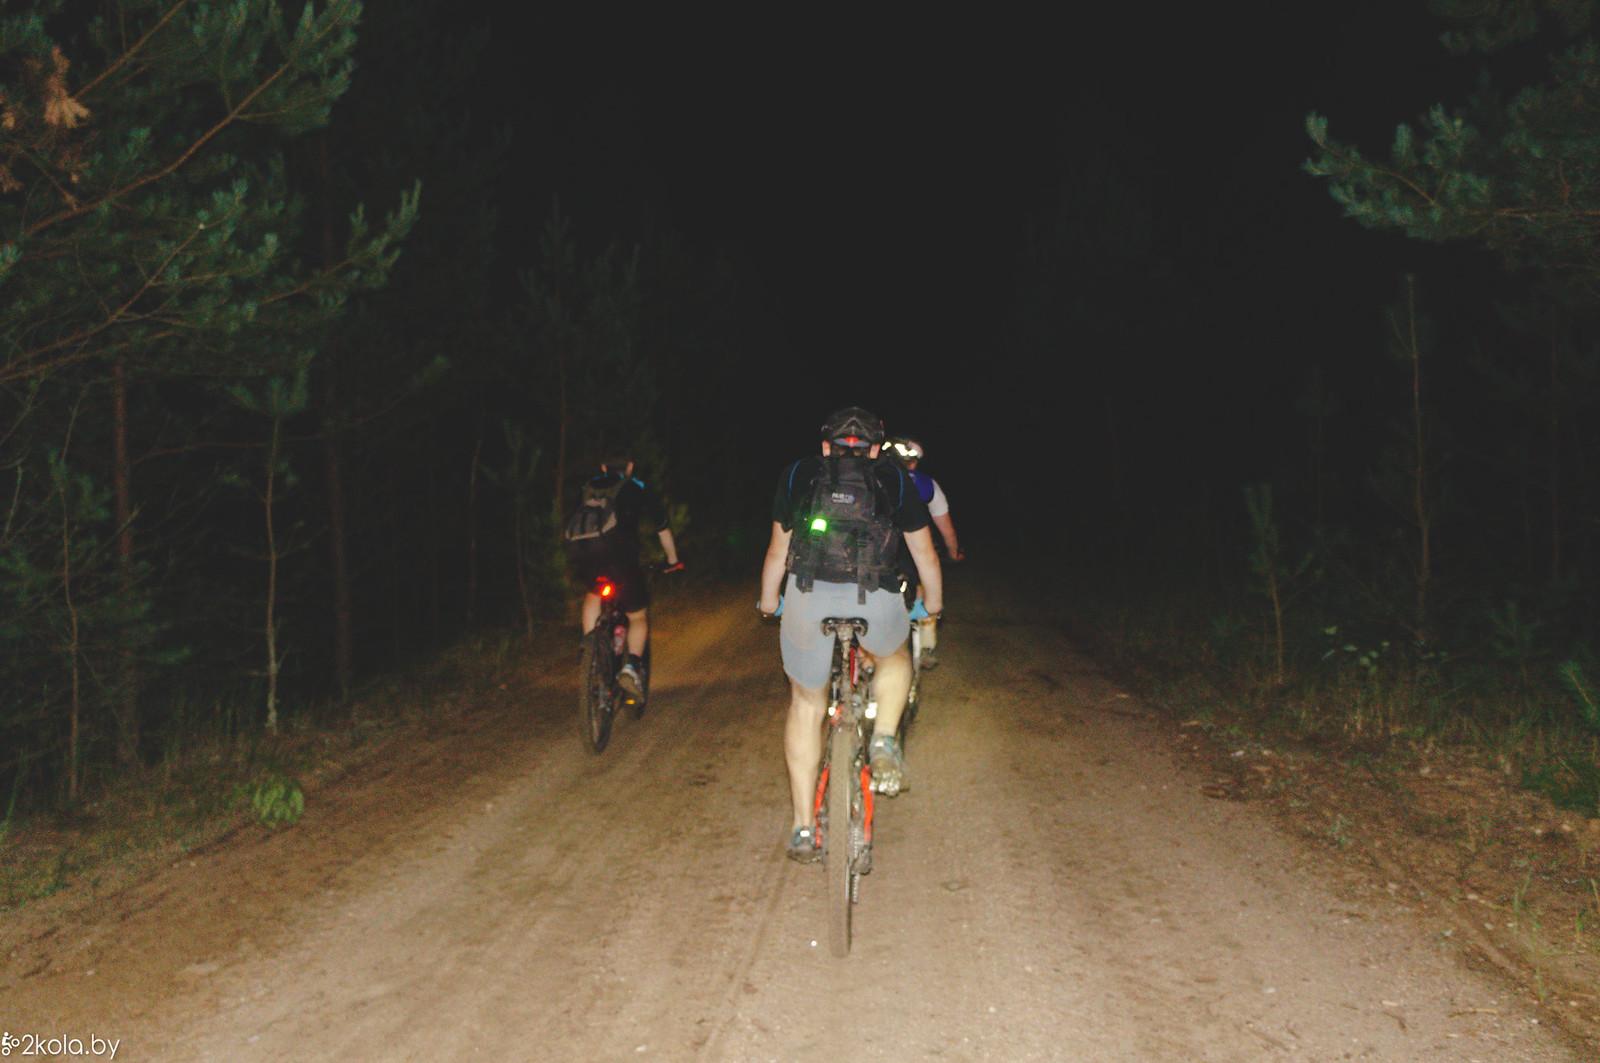 По ночному лесу